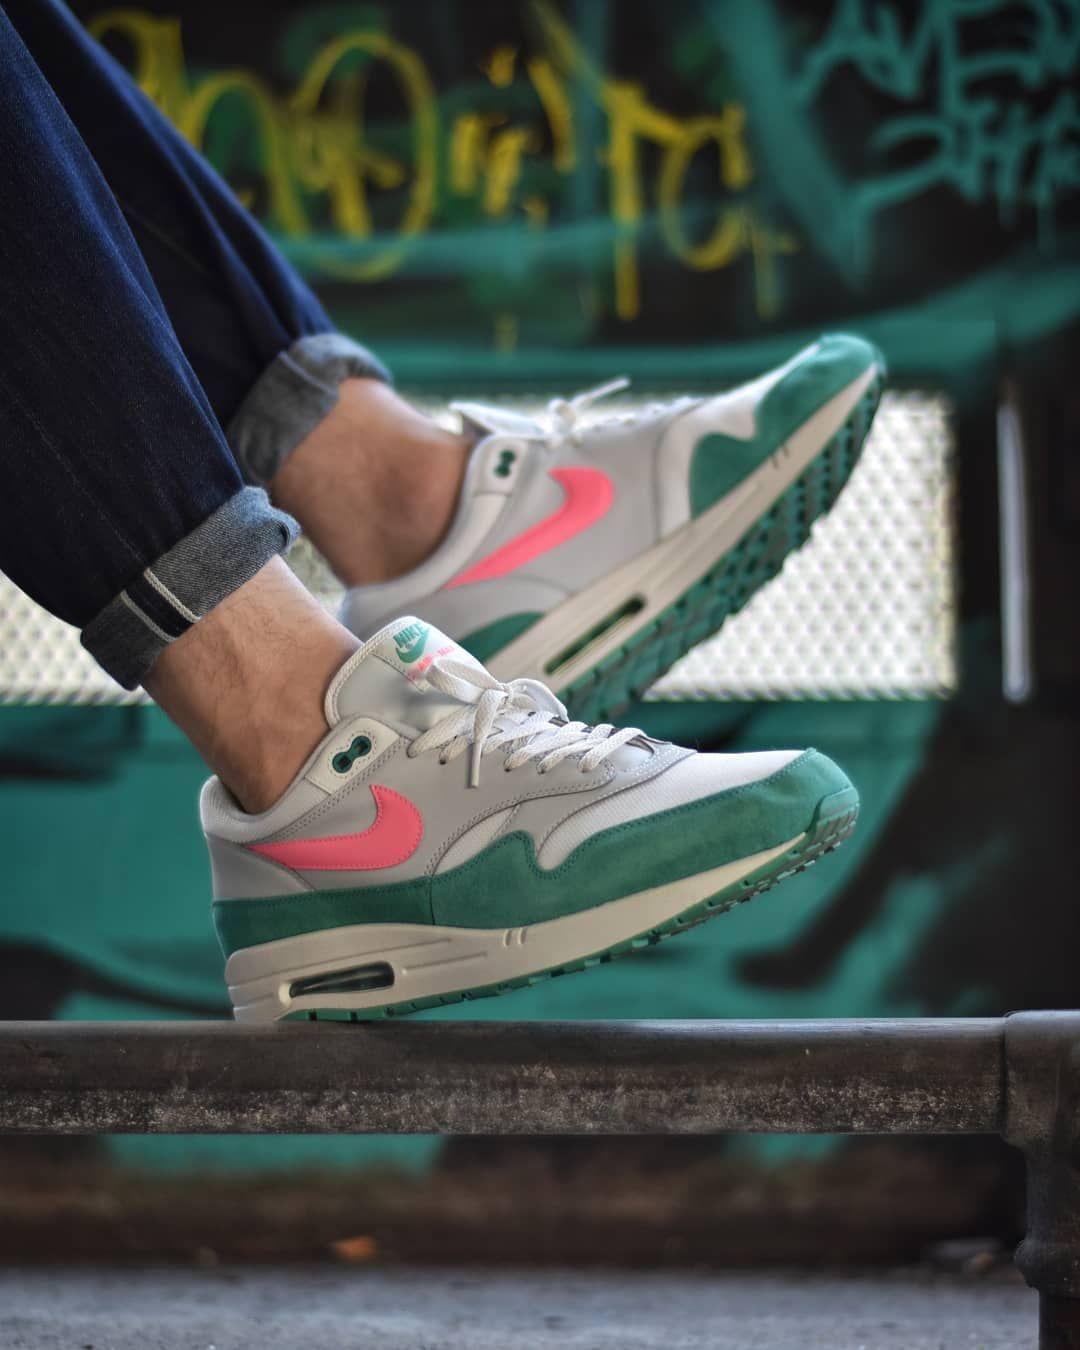 Nike Air Max 1 Watermelon Ah8145 106 South Beach Usd 135 Hkd 1060 New Arrival Order Link Https Www Kickscrew Com Detail 26298 Nike 20air 20max 201 Wat